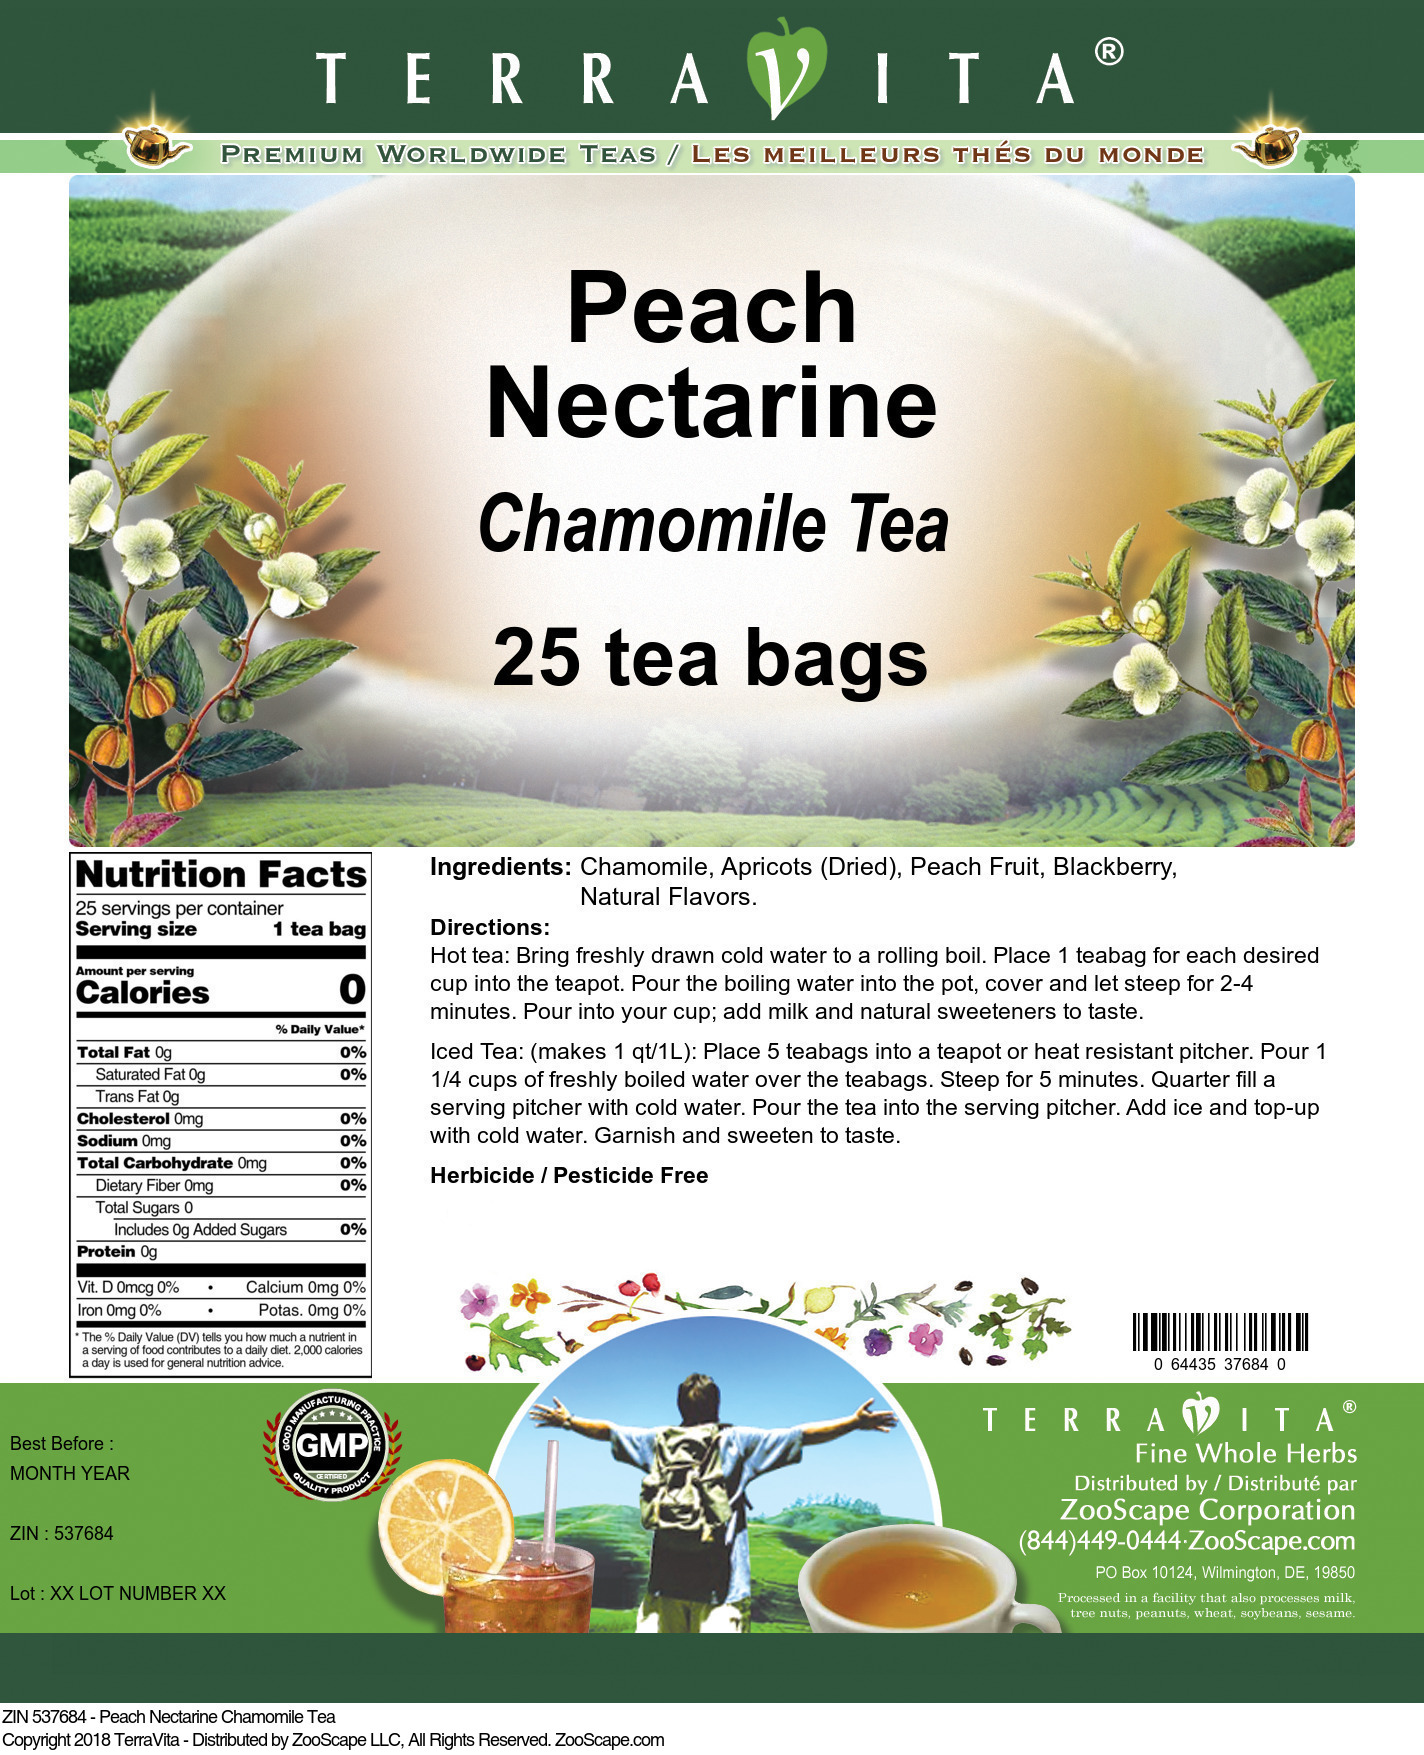 Peach Nectarine Chamomile Tea